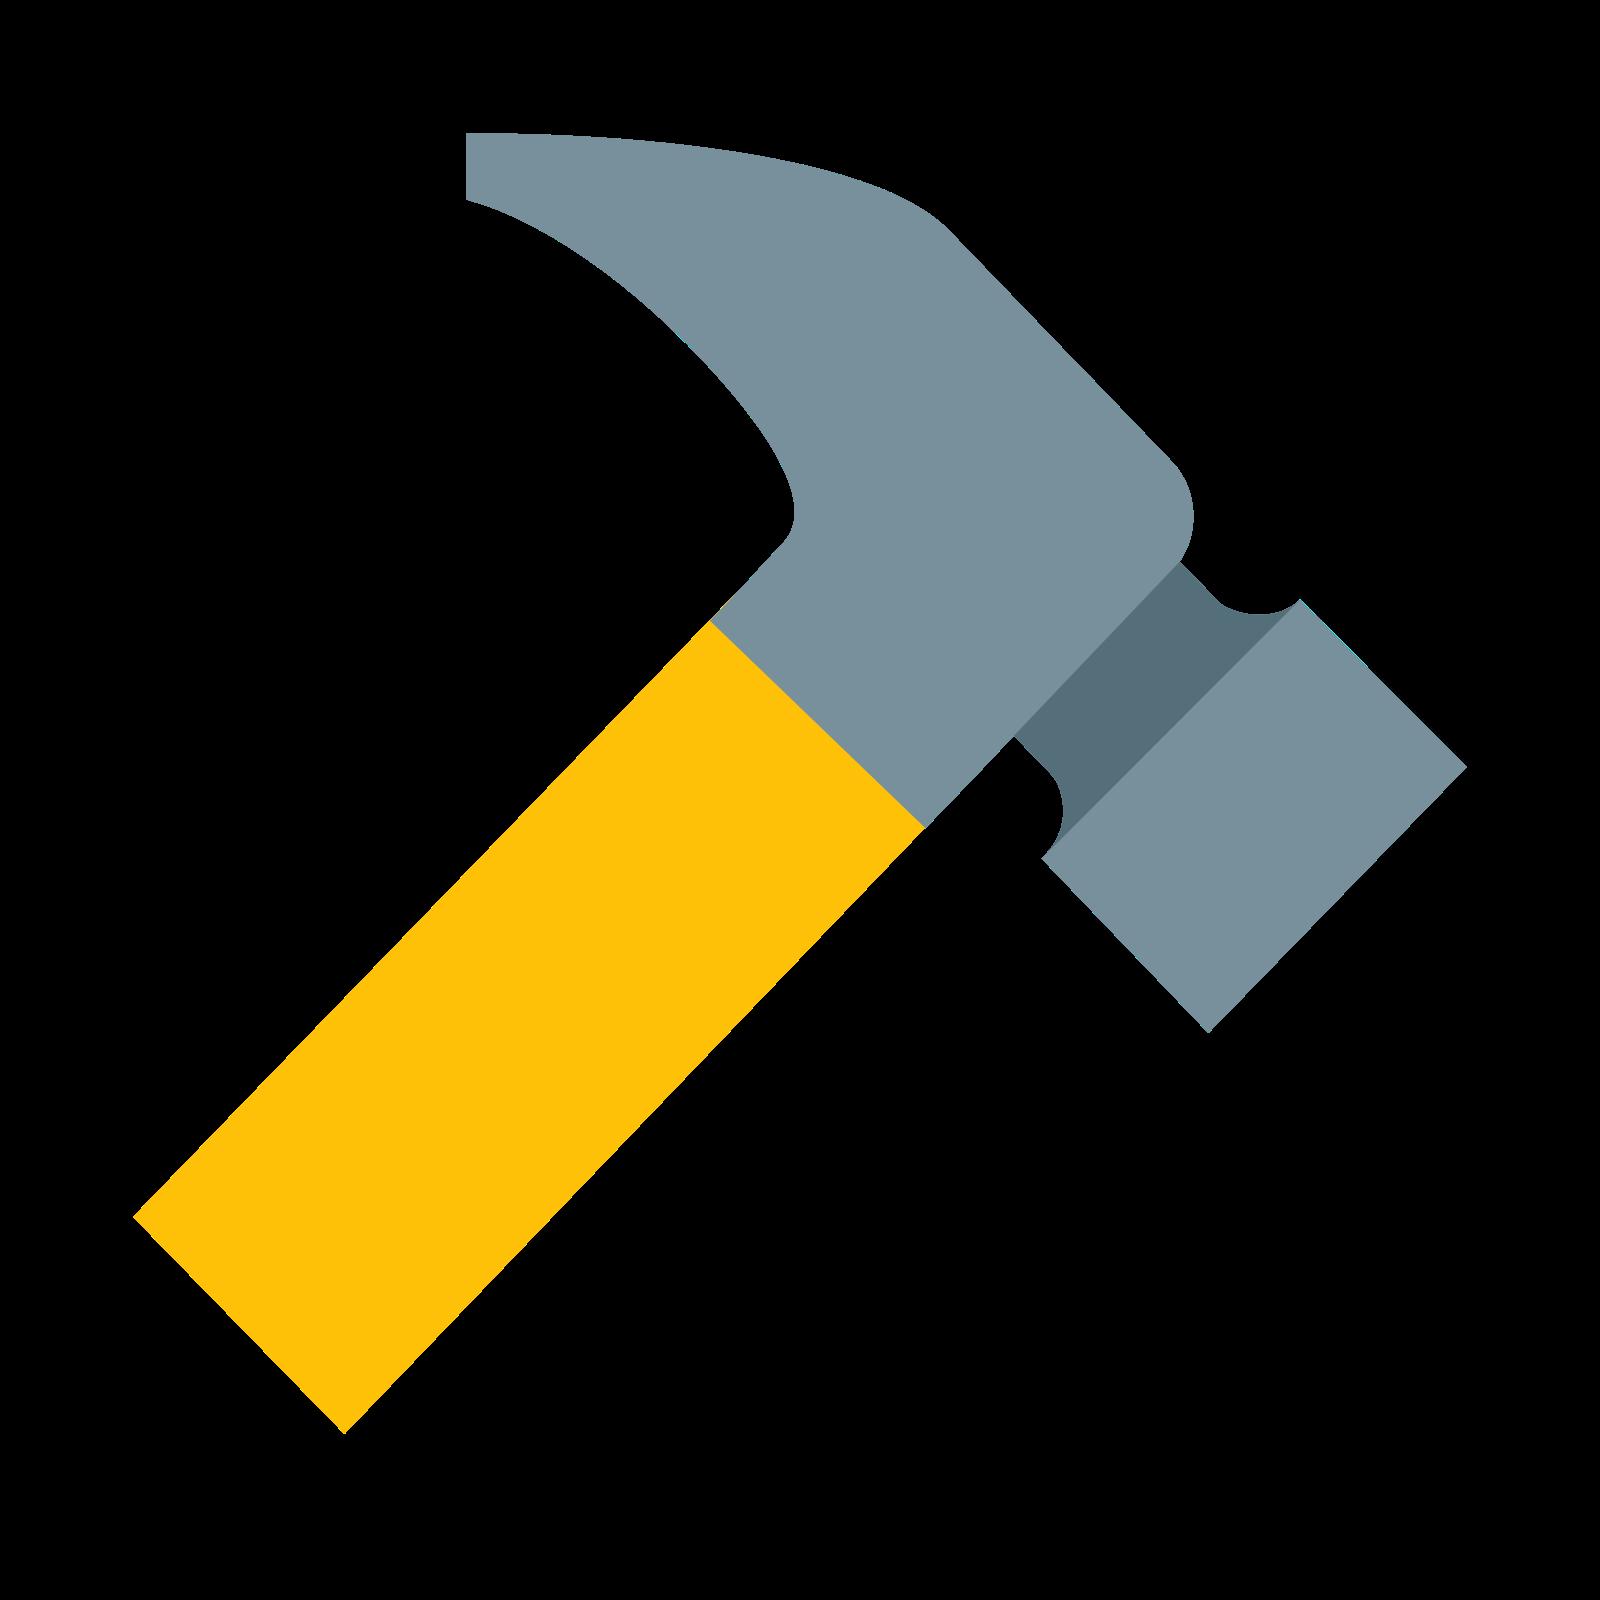 Martelo icon